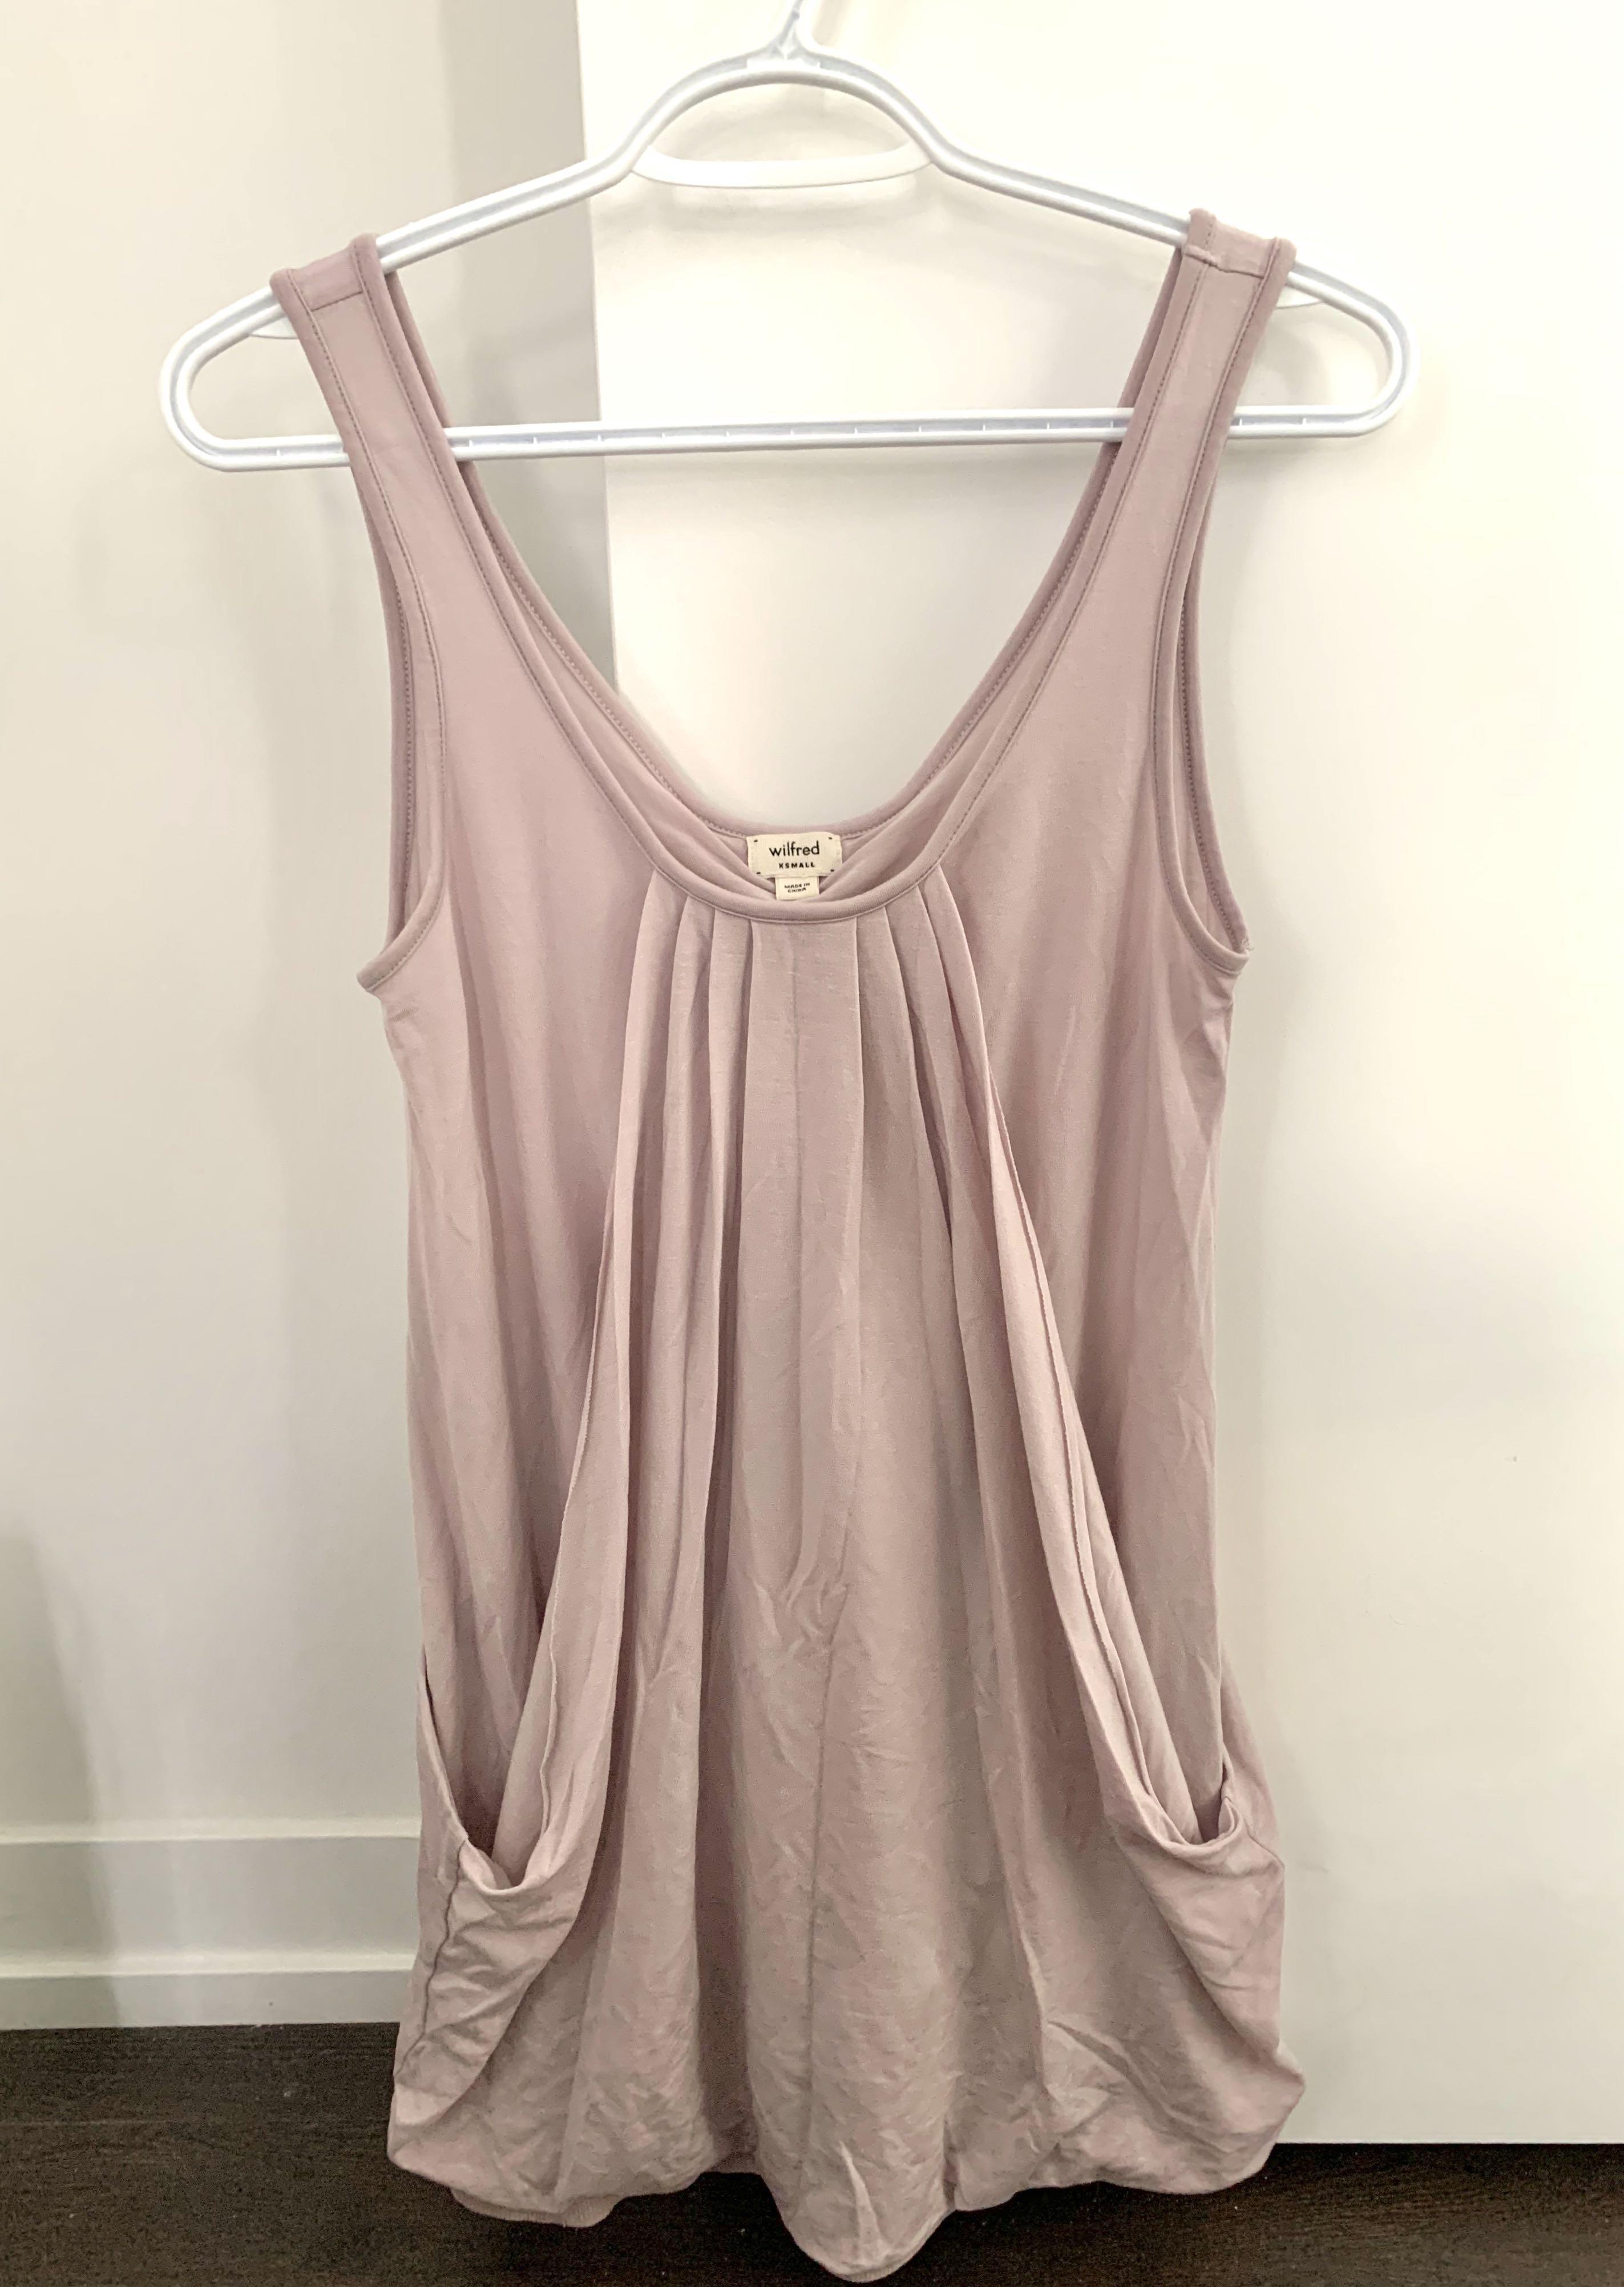 Aritzia Wilfred tank top dress size xs